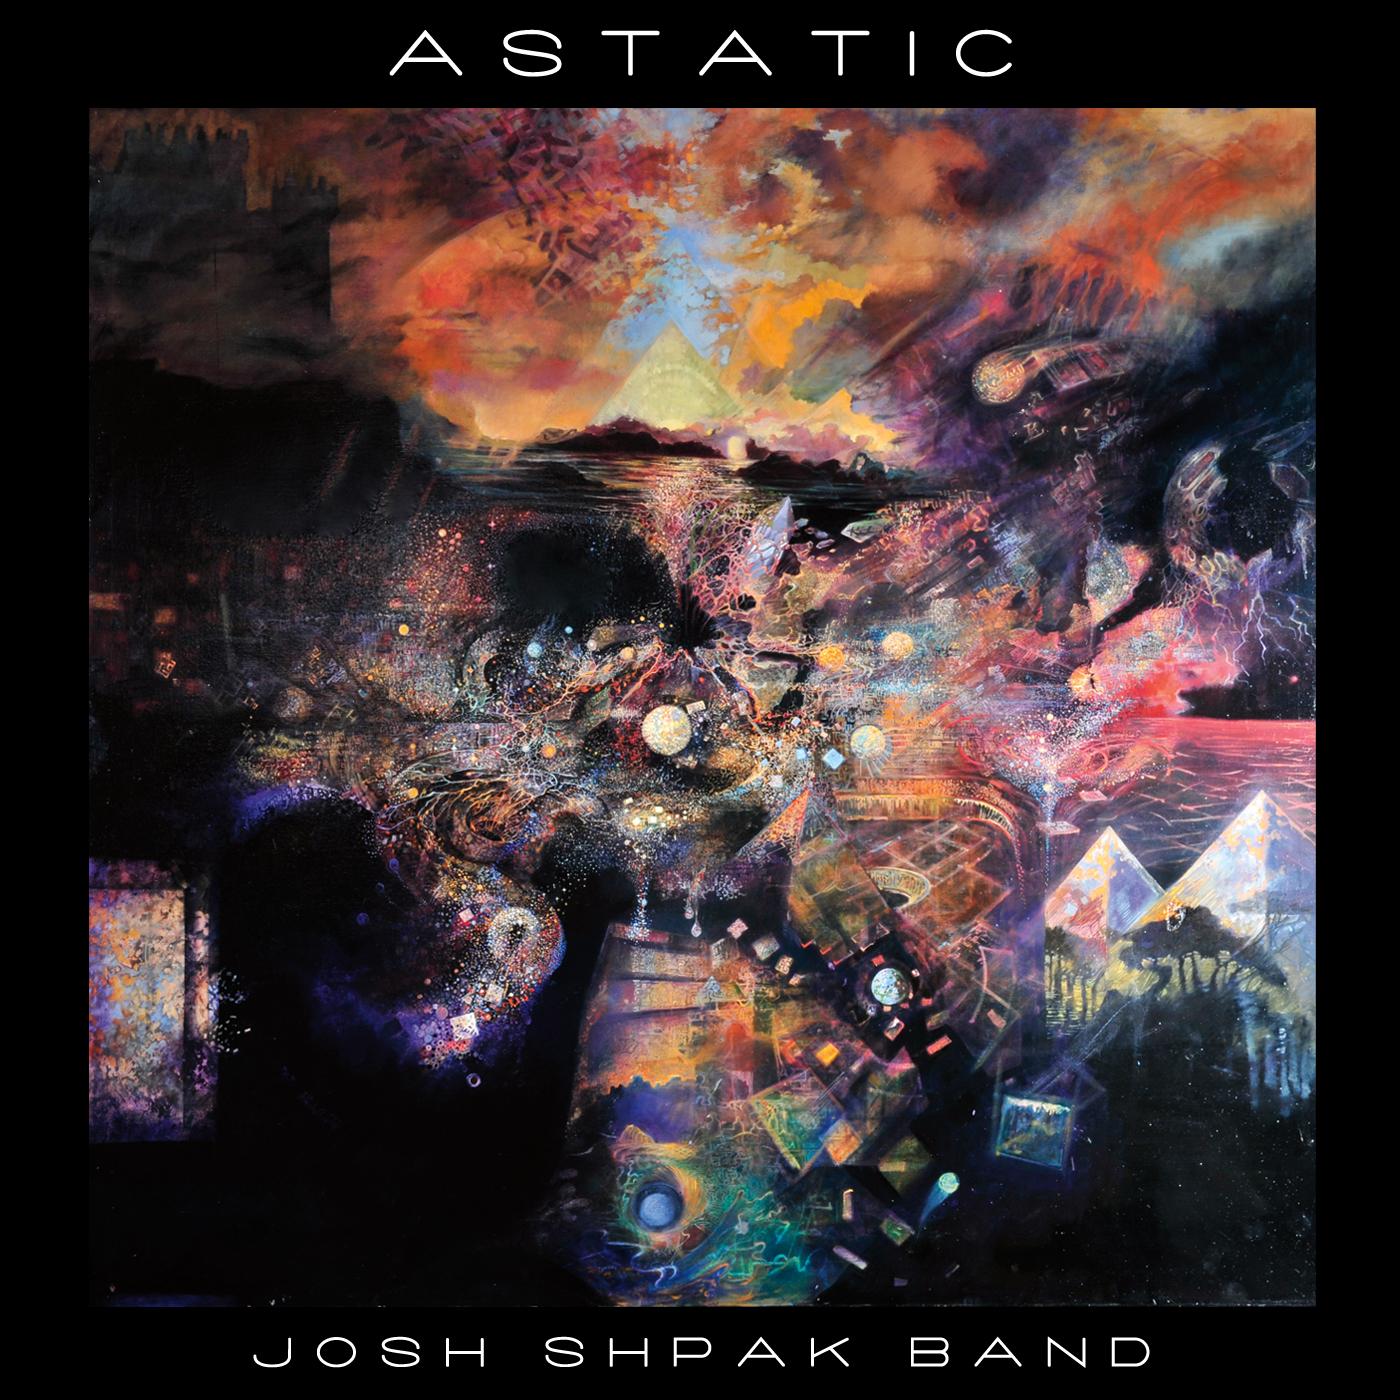 Josh Shpak's 'Astatic' Reviewed by BeBop Spoken Here